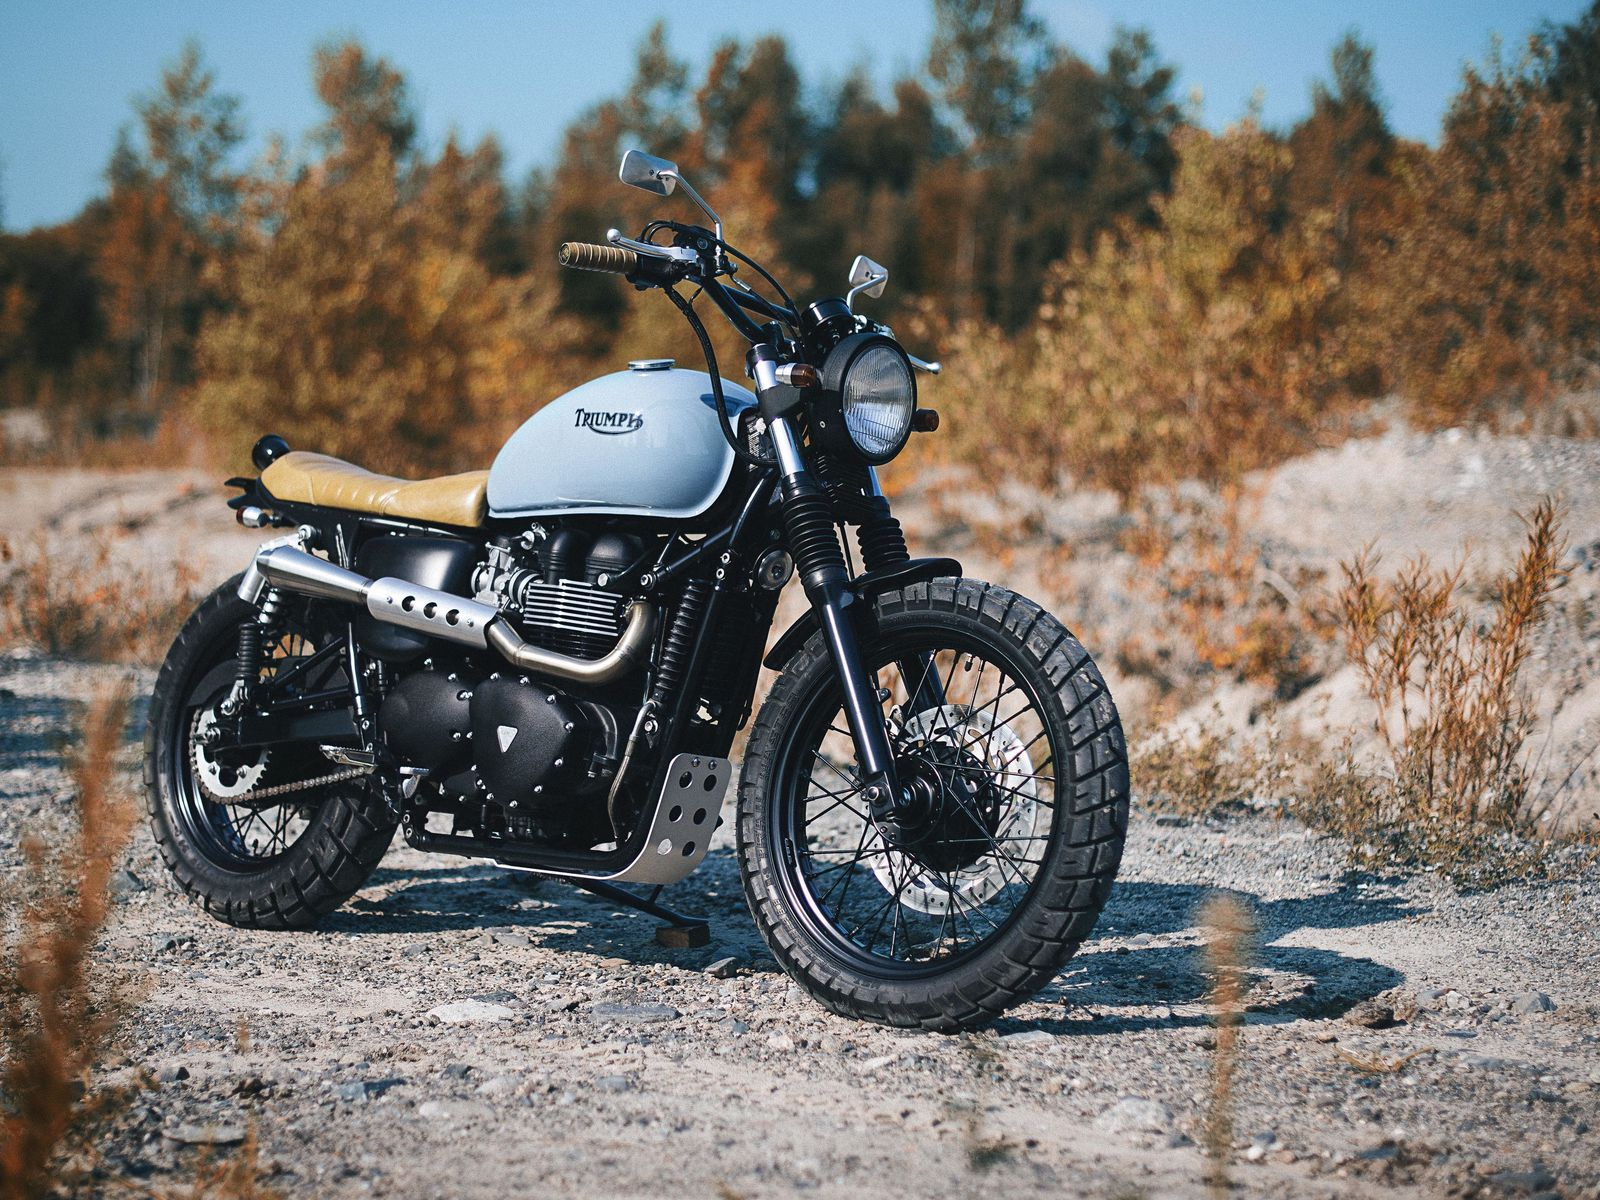 1600x1200 Обои triumph, bonneville, мотоцикл, вид сбоку